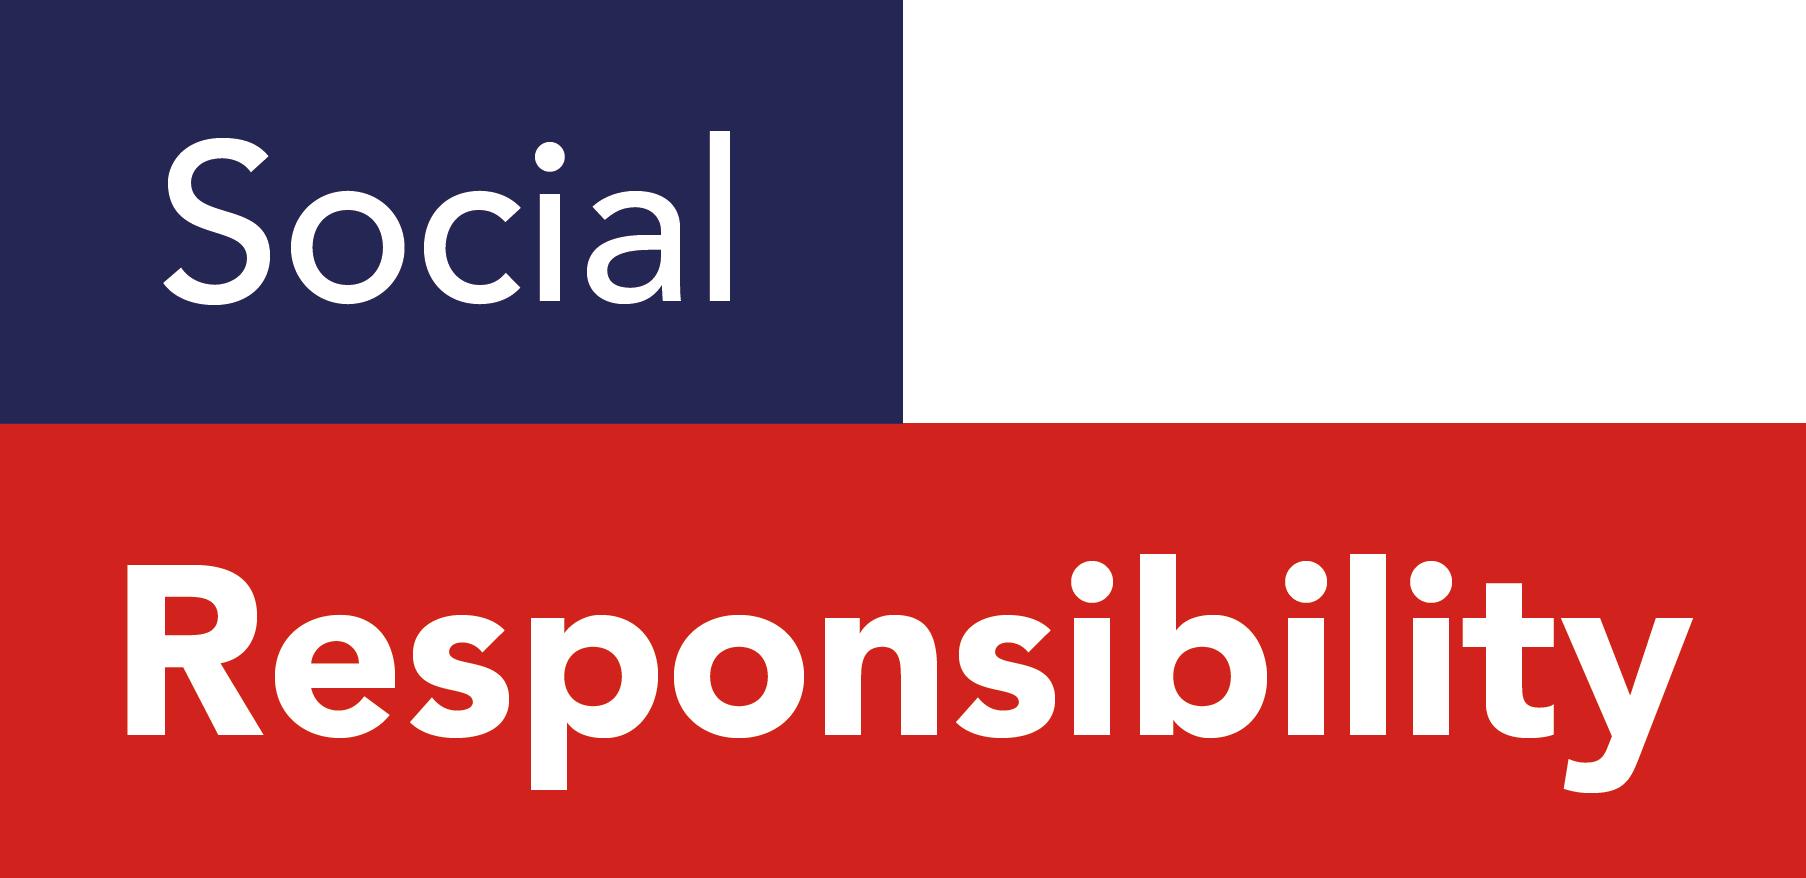 Social Responsibility@3x